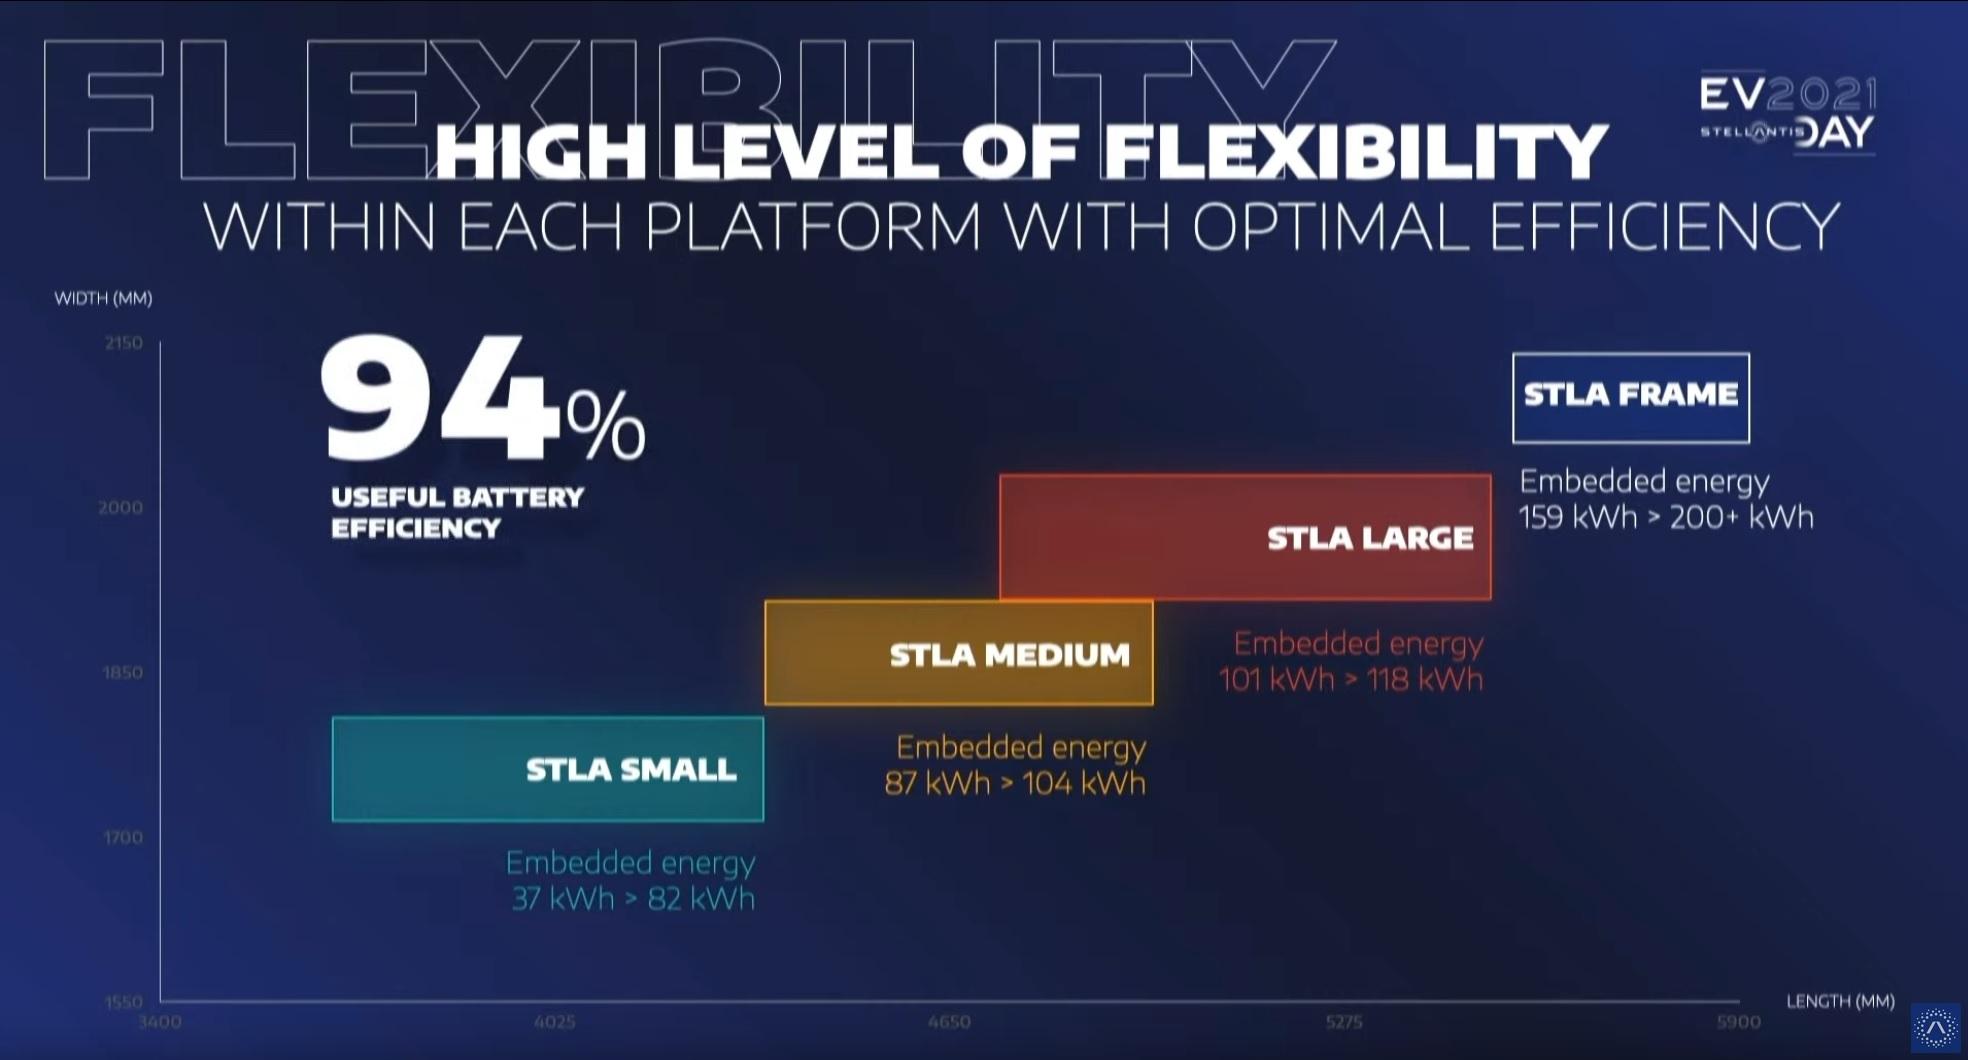 stellantis-bev-centric-platforms-d.jpeg